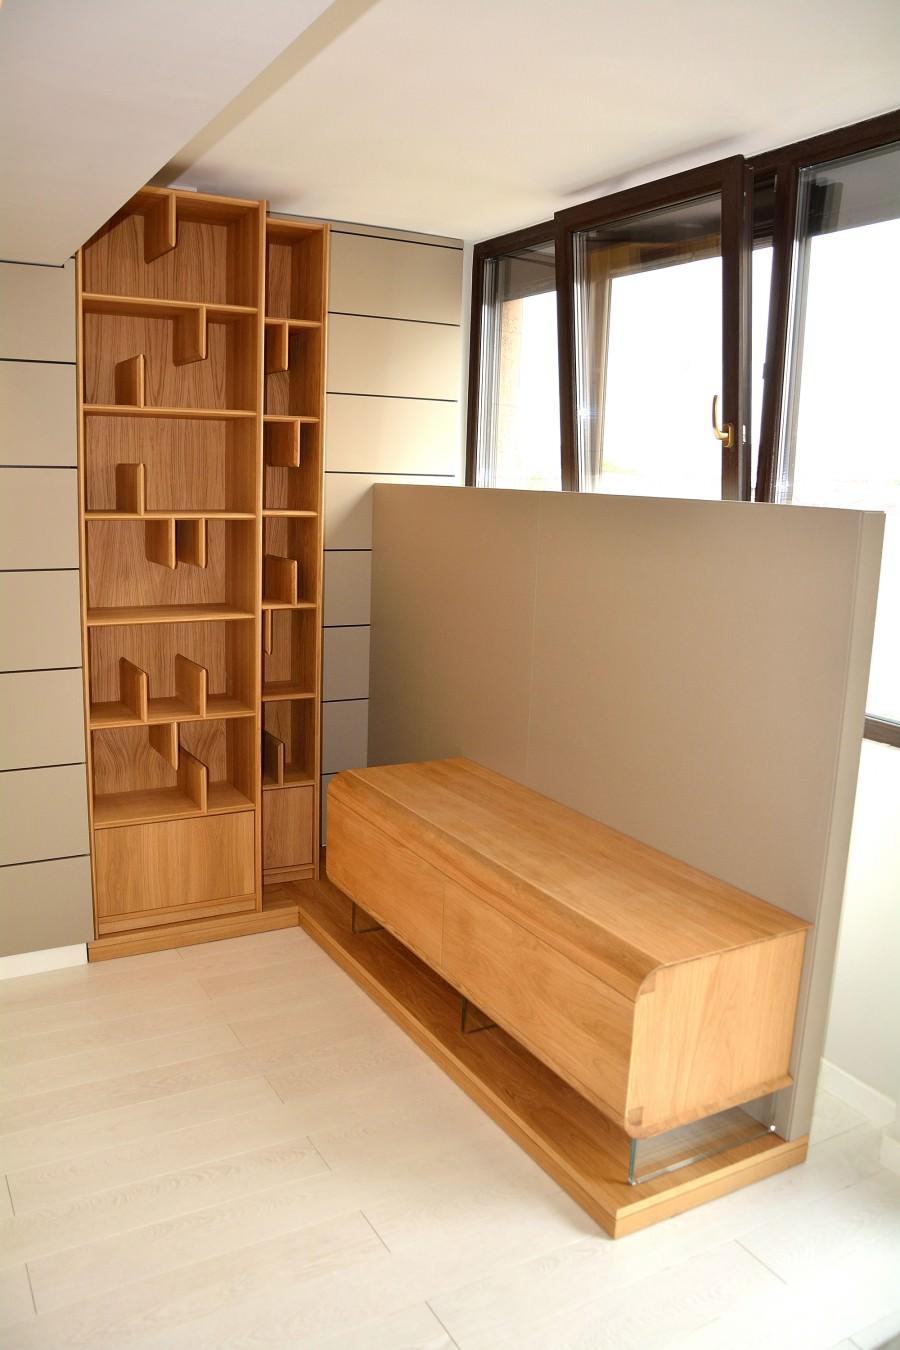 Living realizat modern din placari pereti mdf vopsit gri cu mobilier lemn masiv natural din stejar masiv 900x1350 1